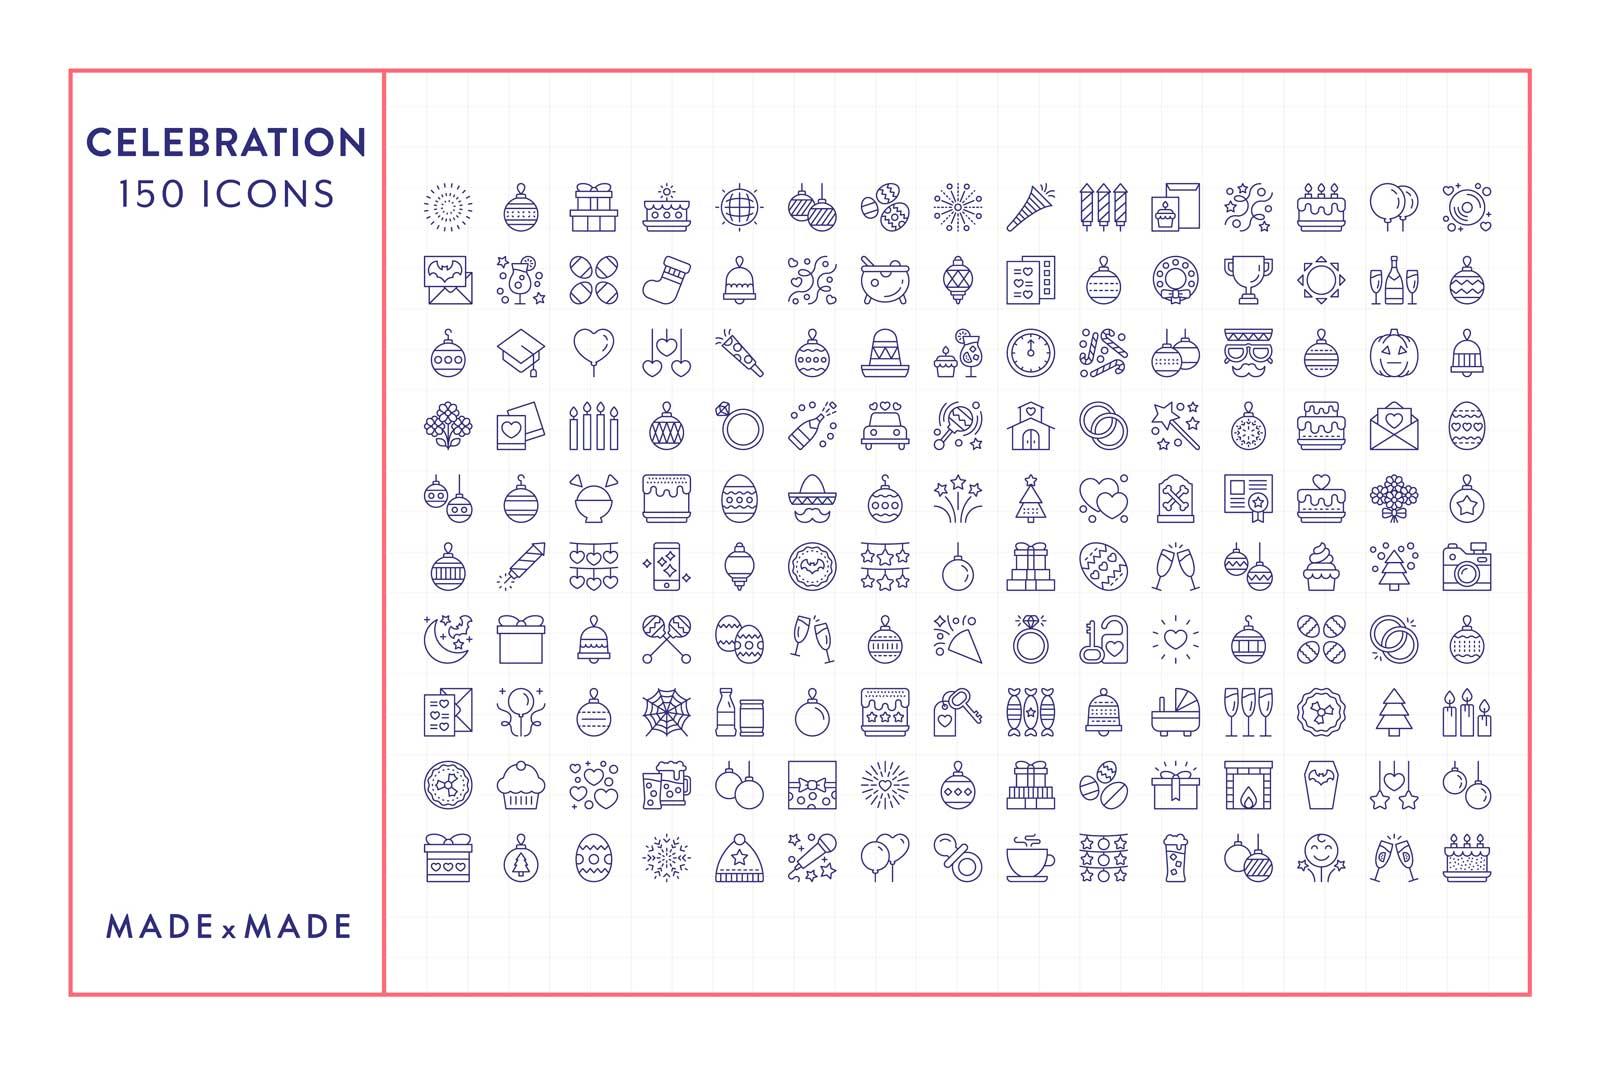 made x made icons celebration